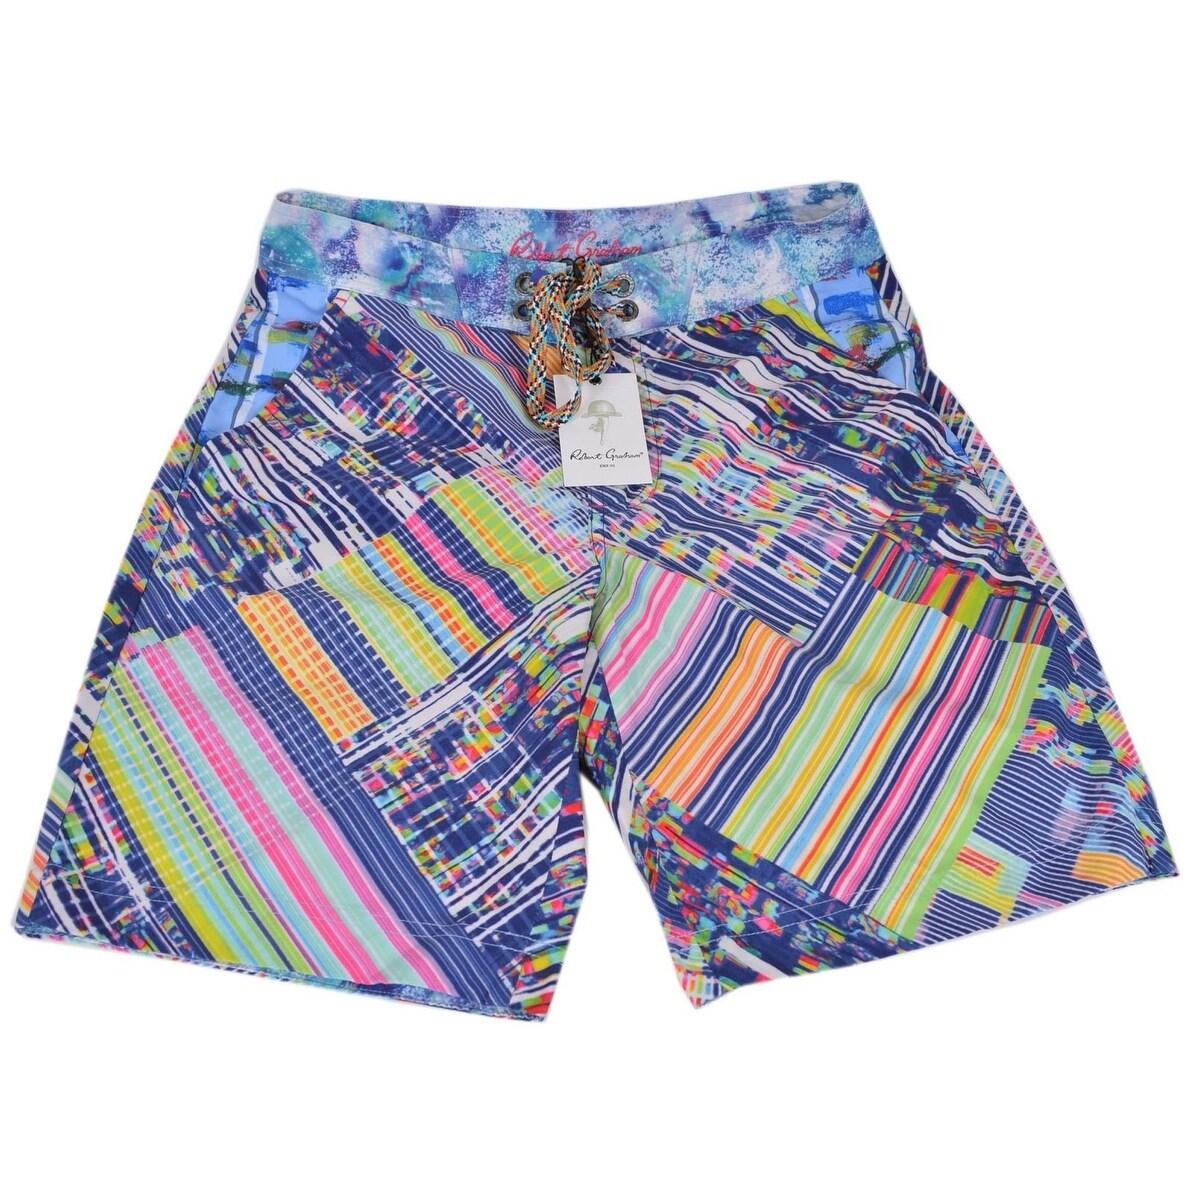 6a00b35484 Robert Graham Men's Classic Fit UNIVERSE Board Shorts Swim Trunks